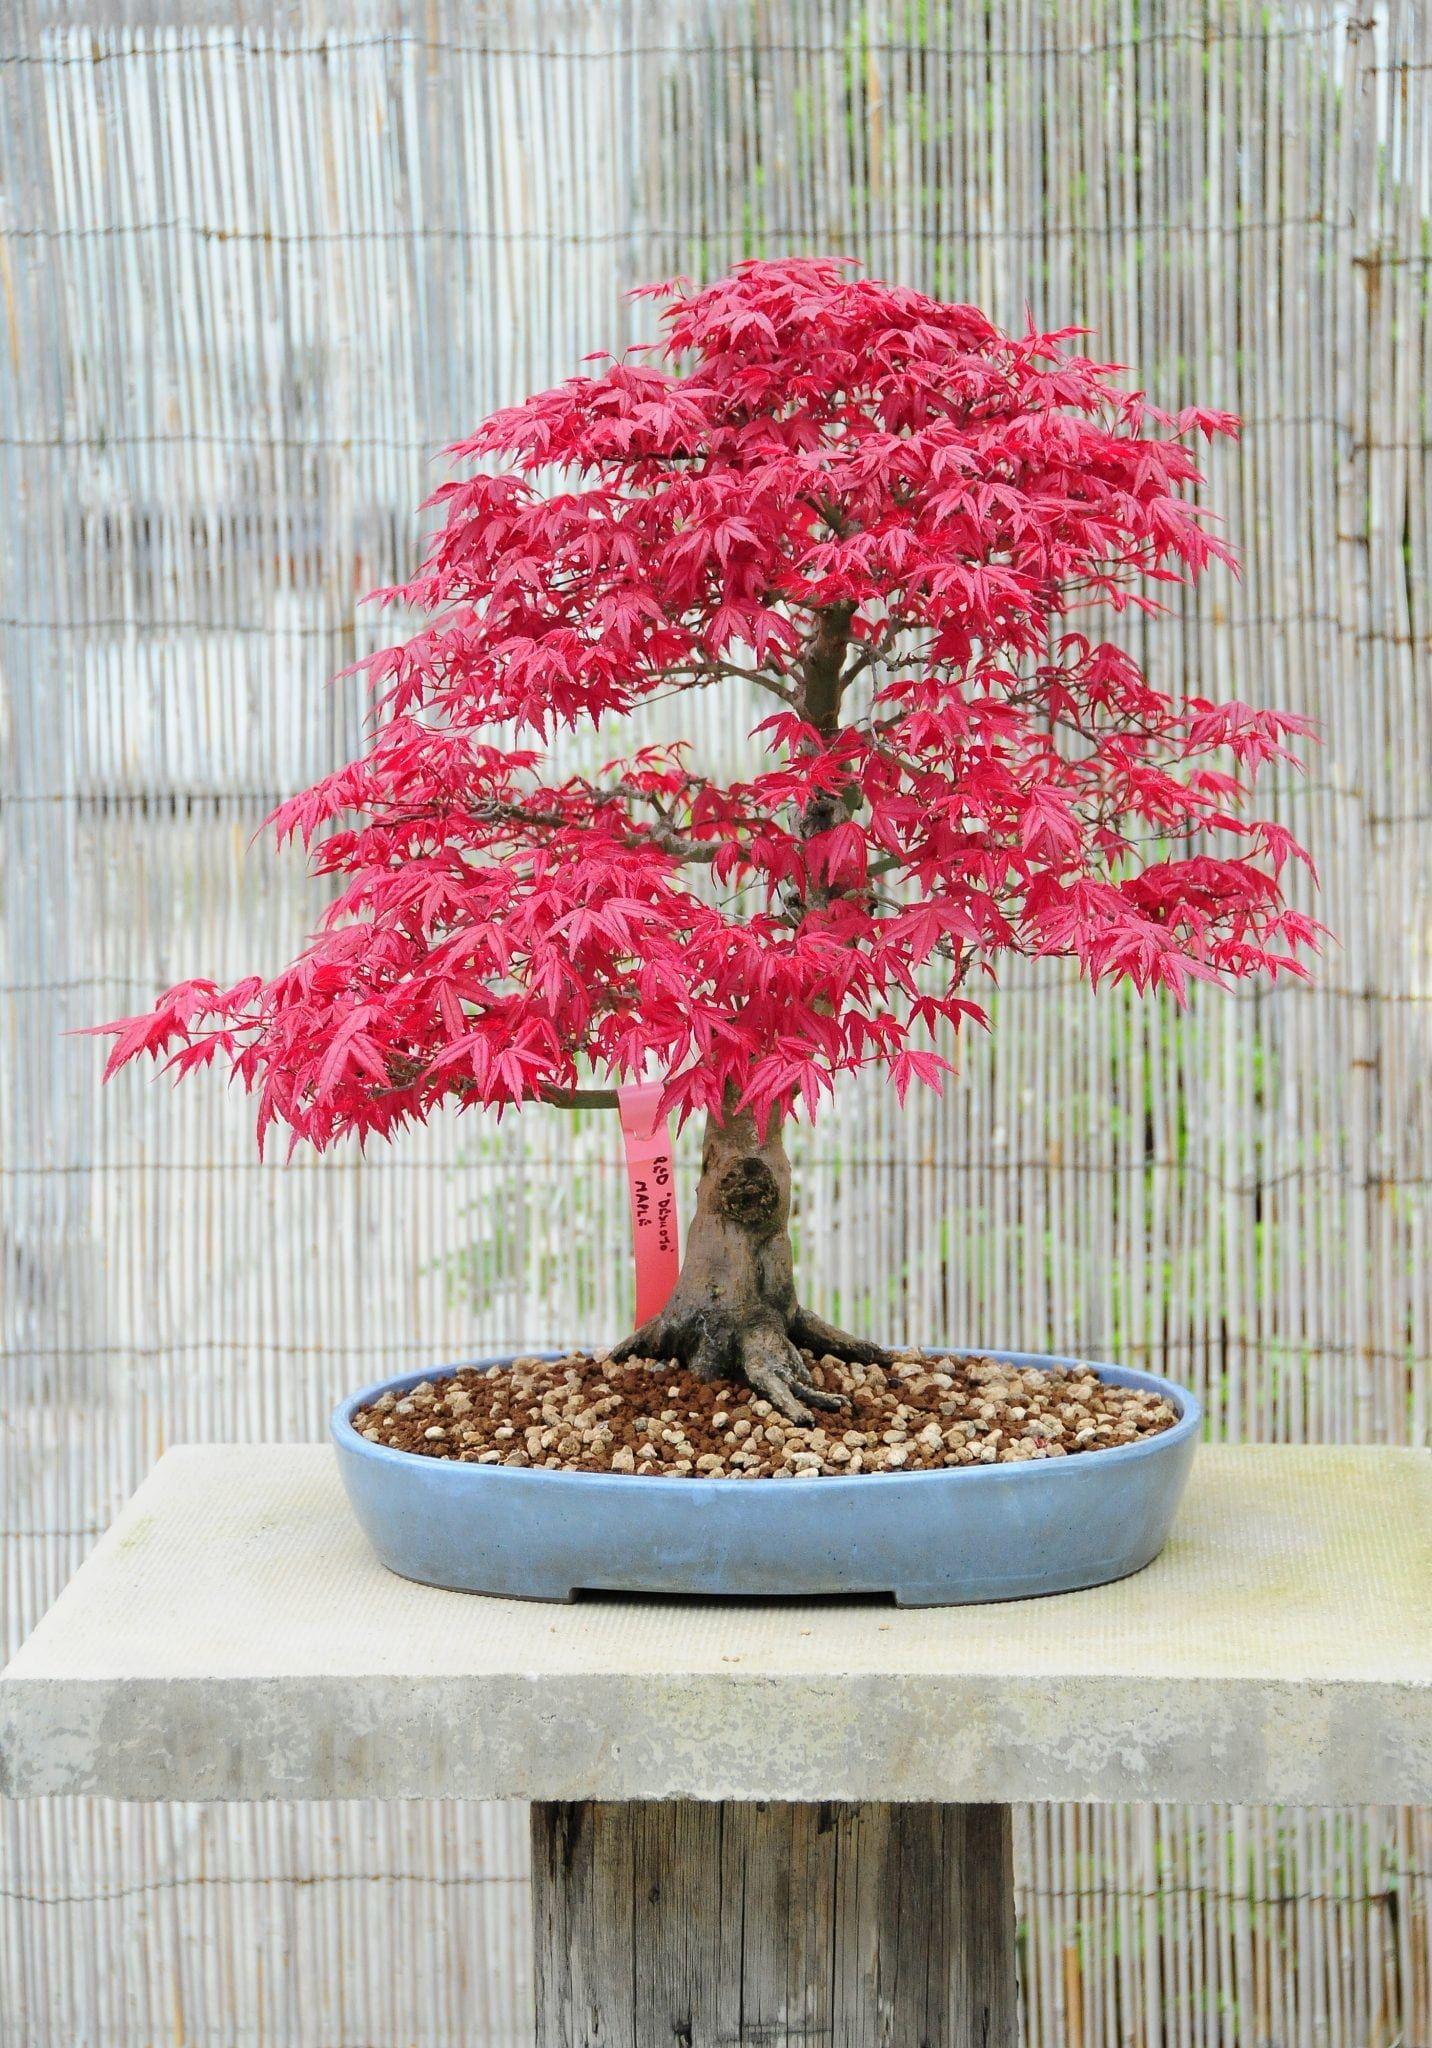 Types of Bonsai Trees | Bonsai Tree Gardener #bonsaiplants